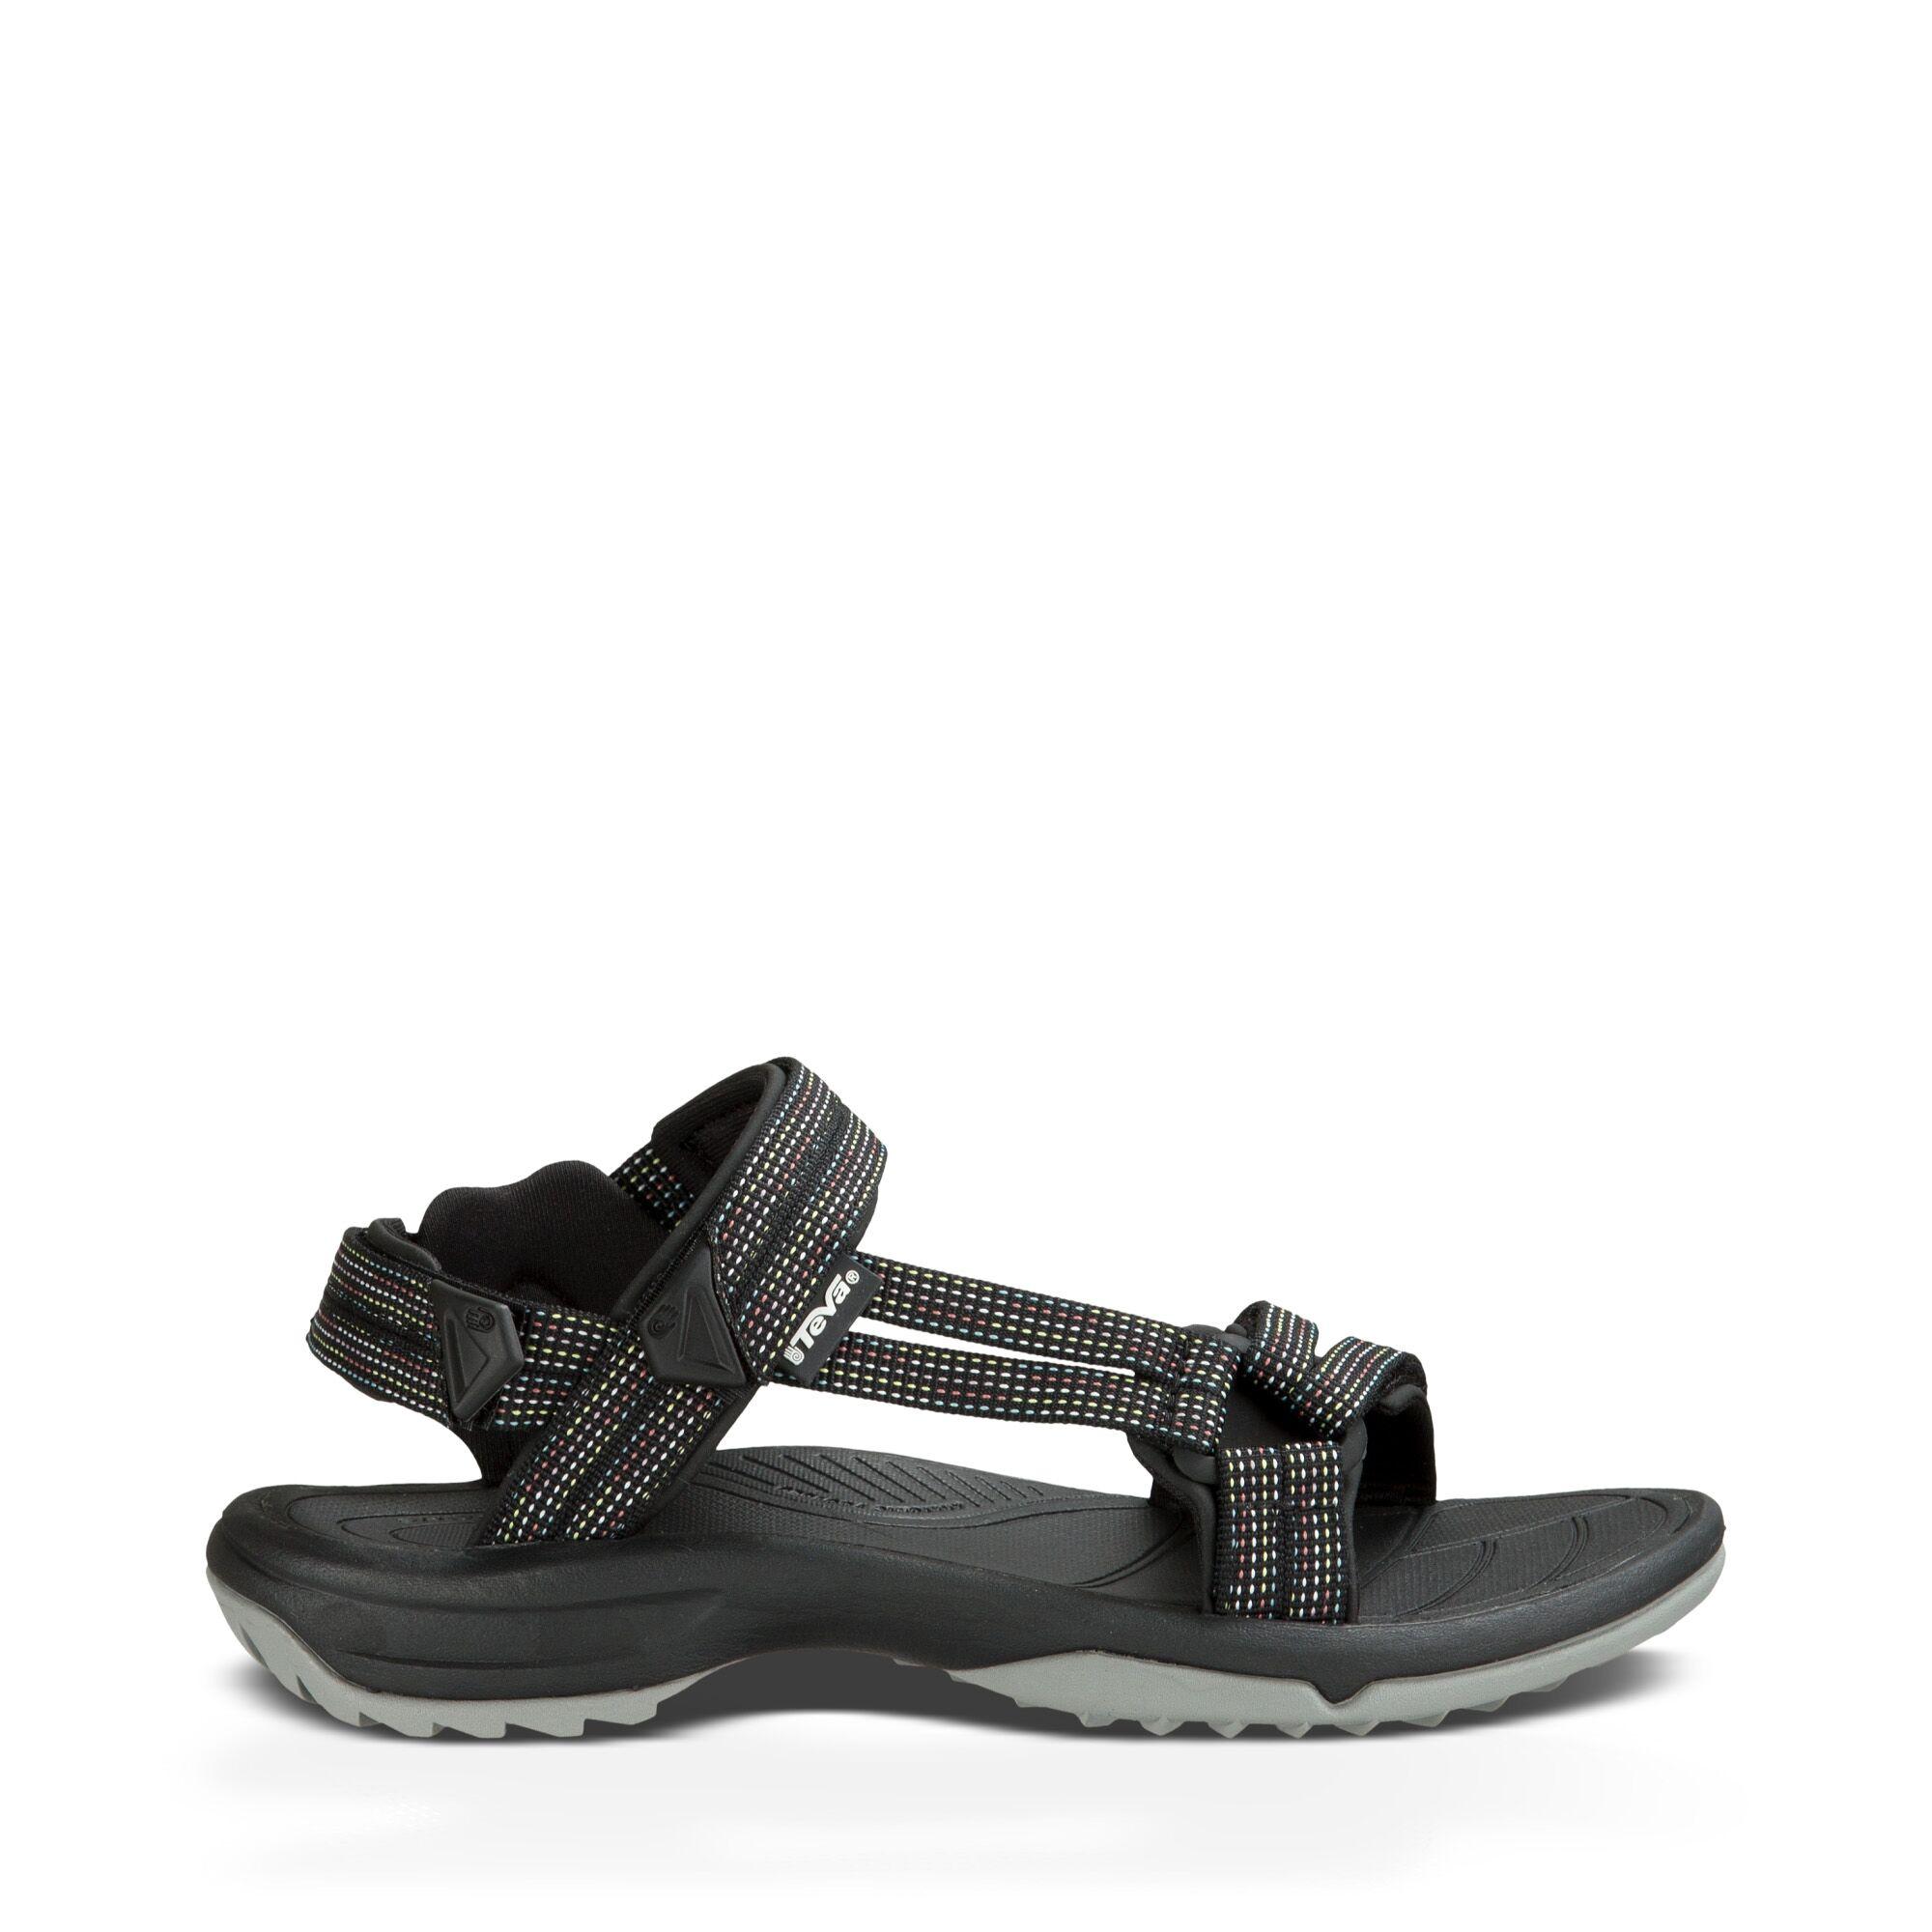 Teva W Terra Fi Lite - Sandal til dame - City Lights Black | Shoes and overlays